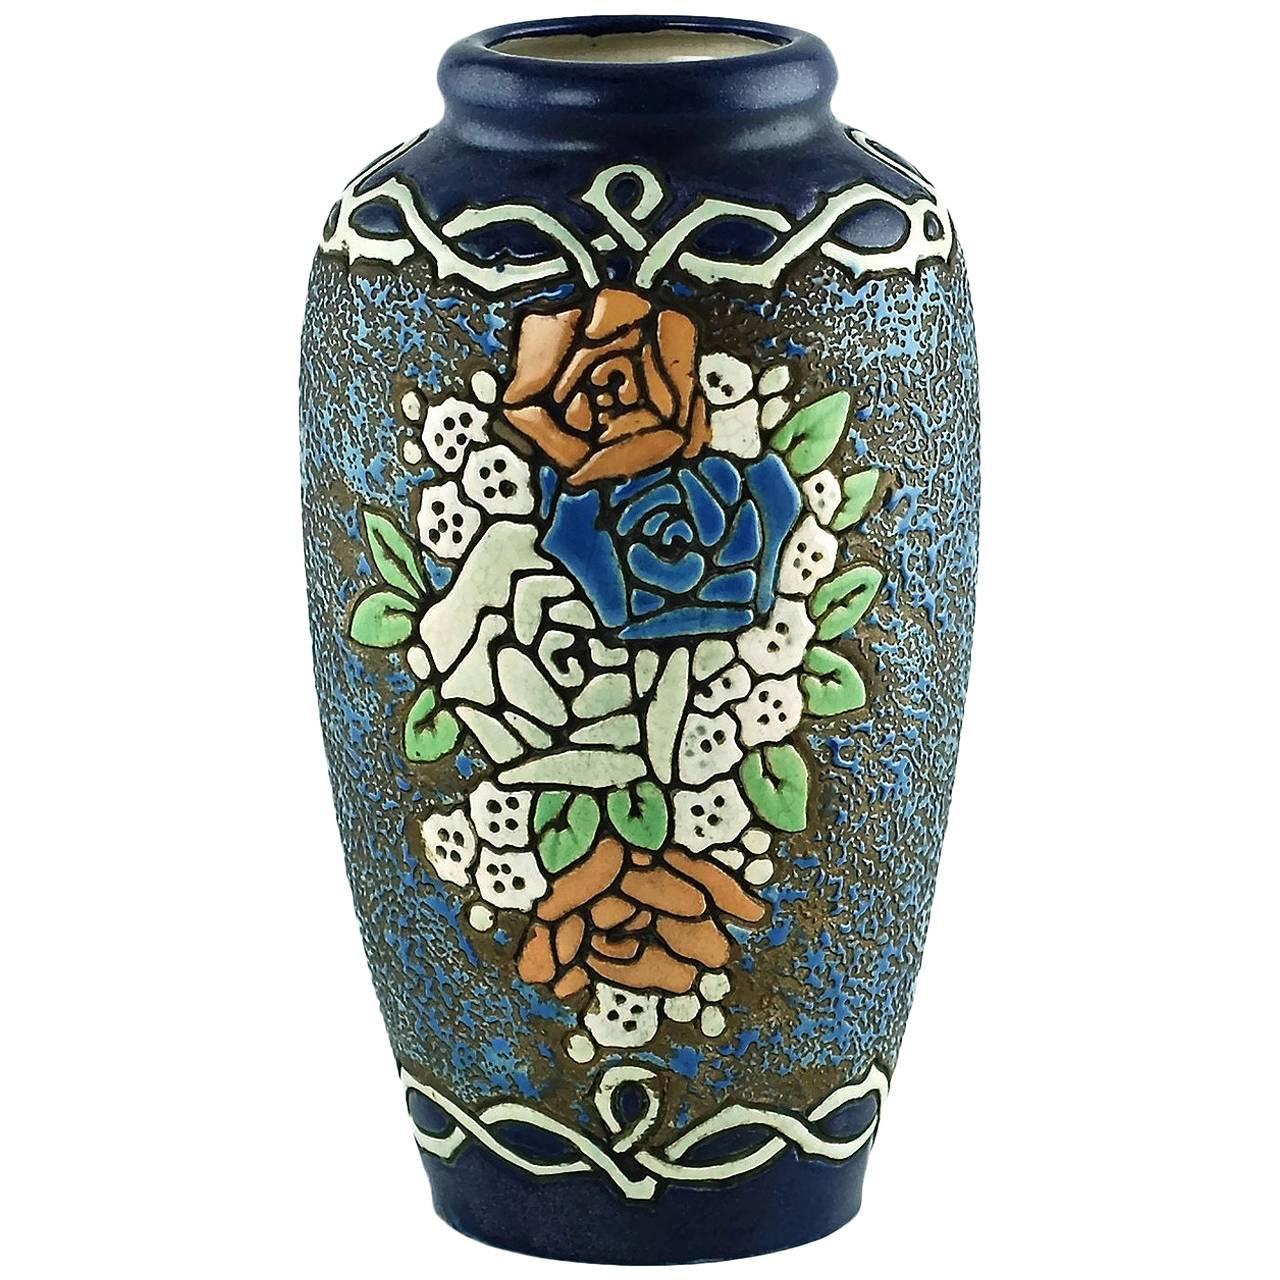 Early 20th Century Amphora Enameled Pottery Vase